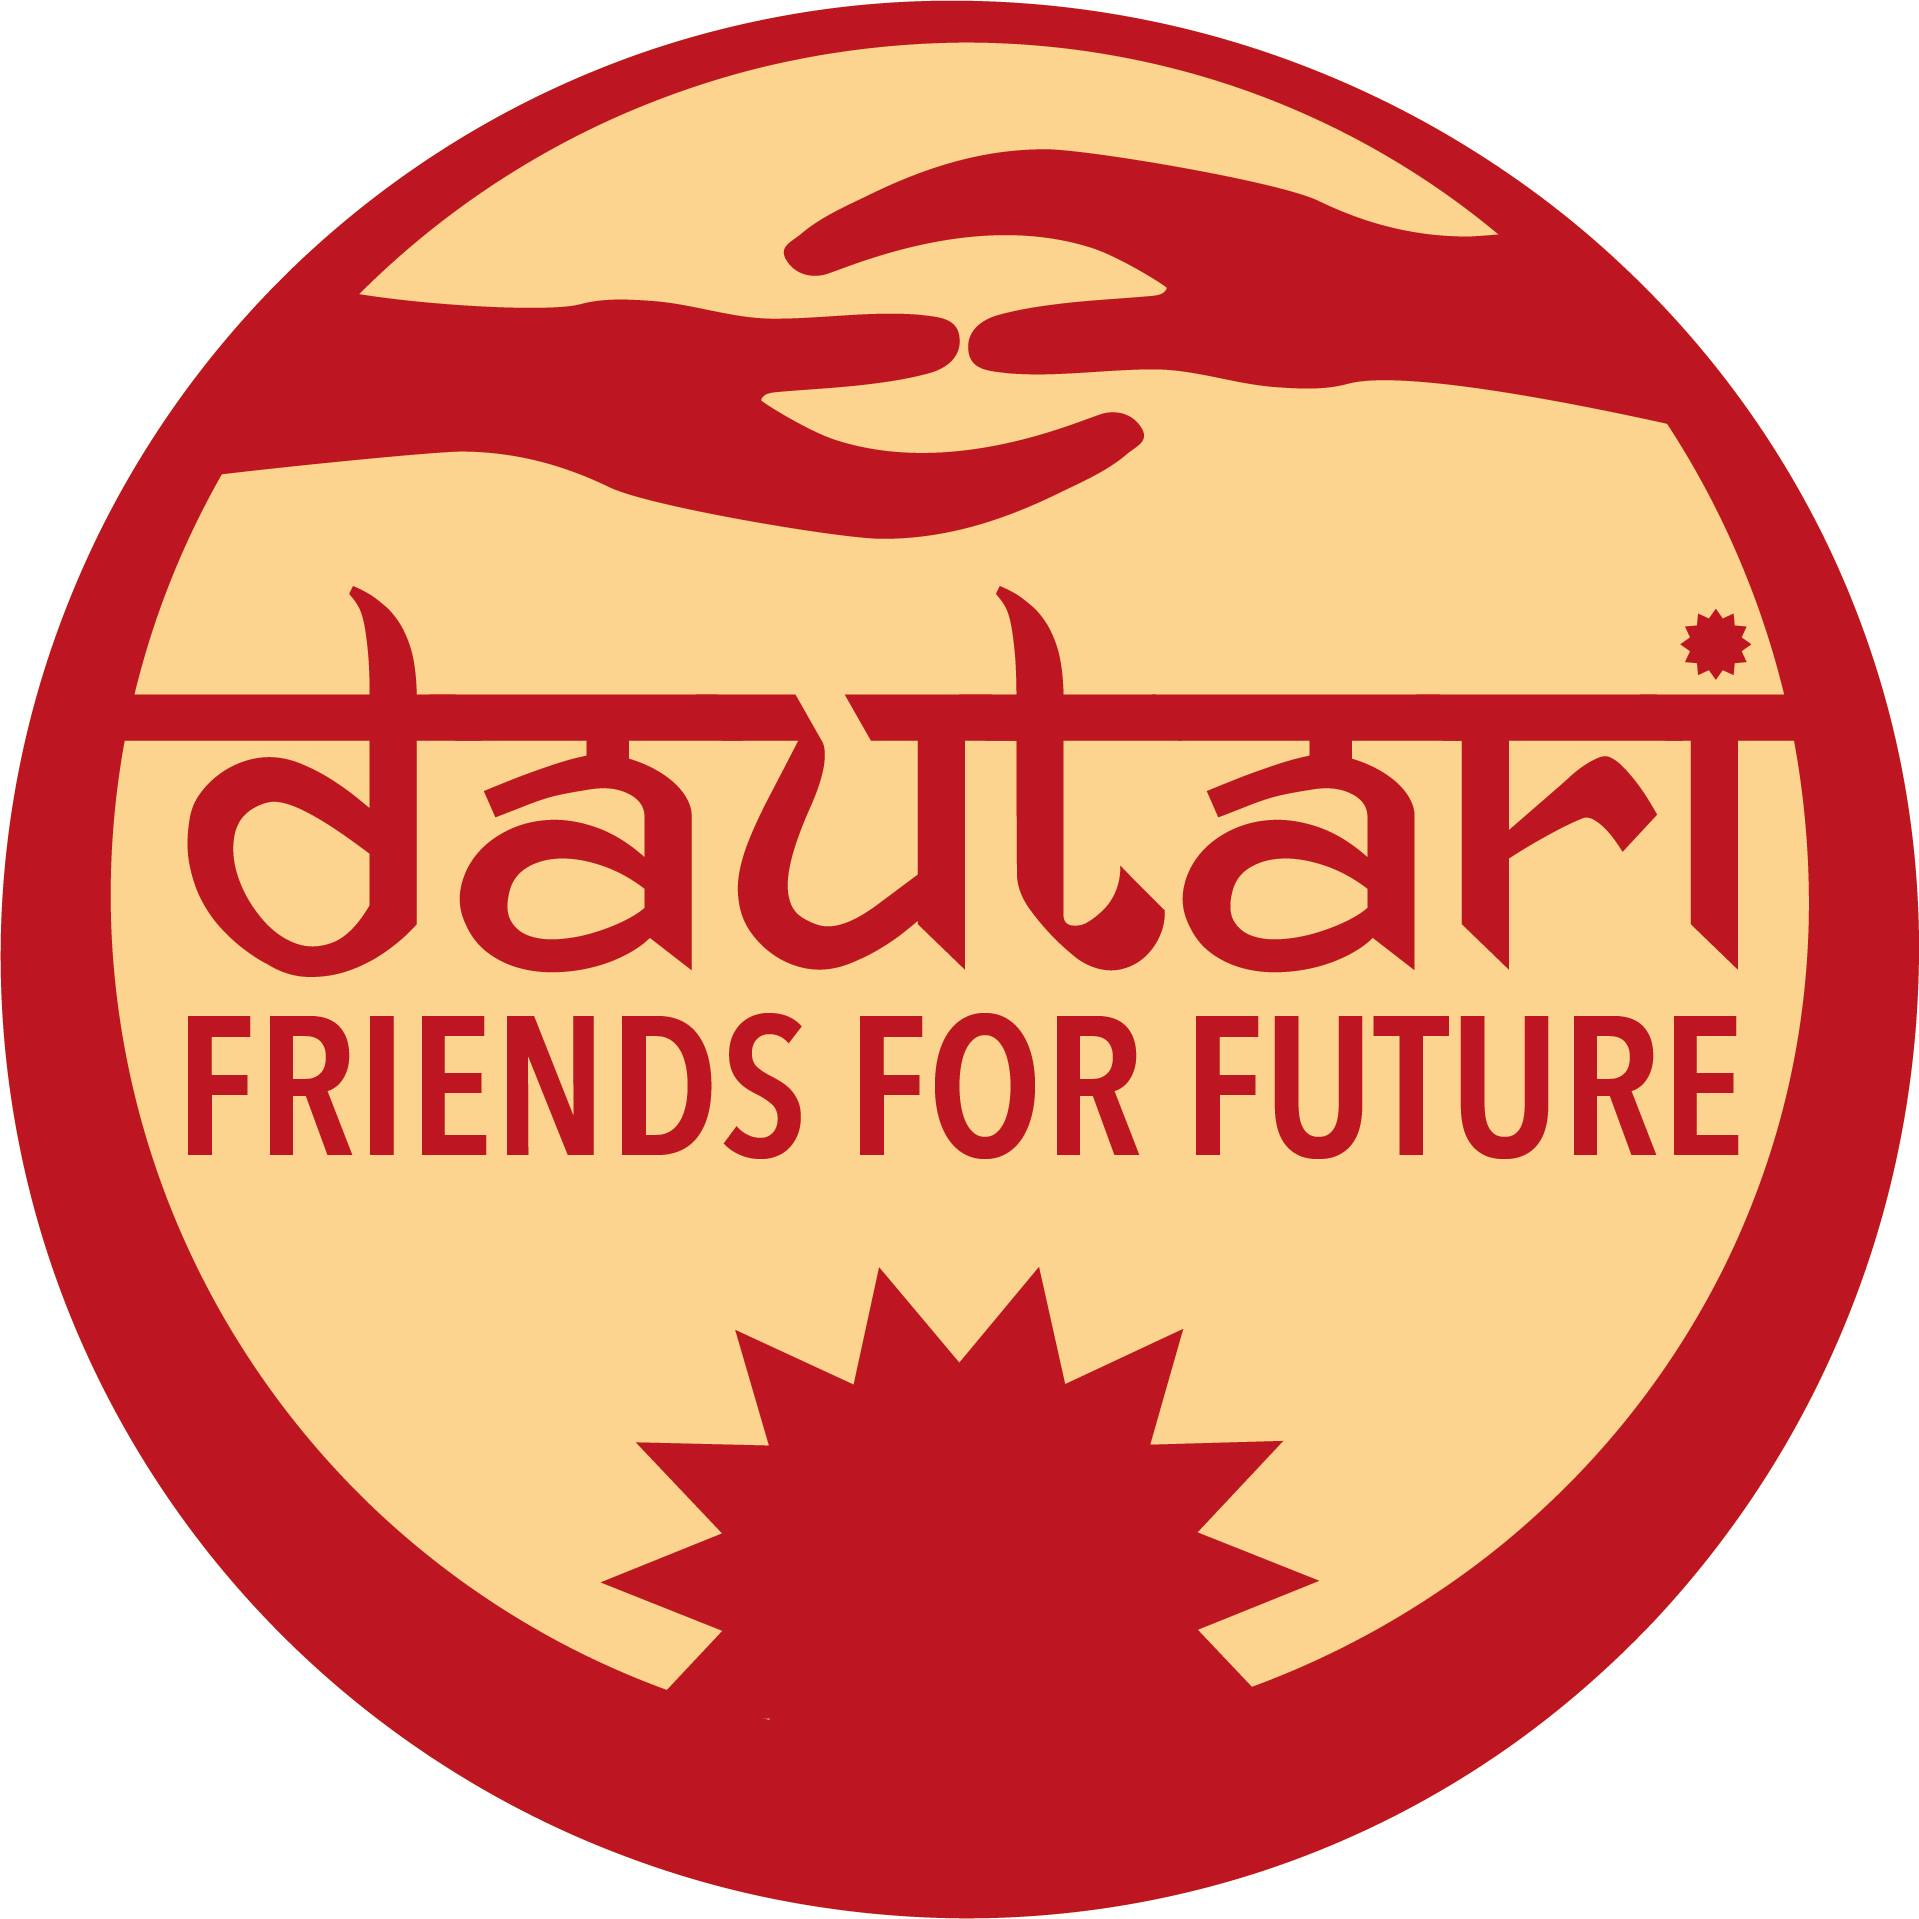 Dautari – Friends for Future